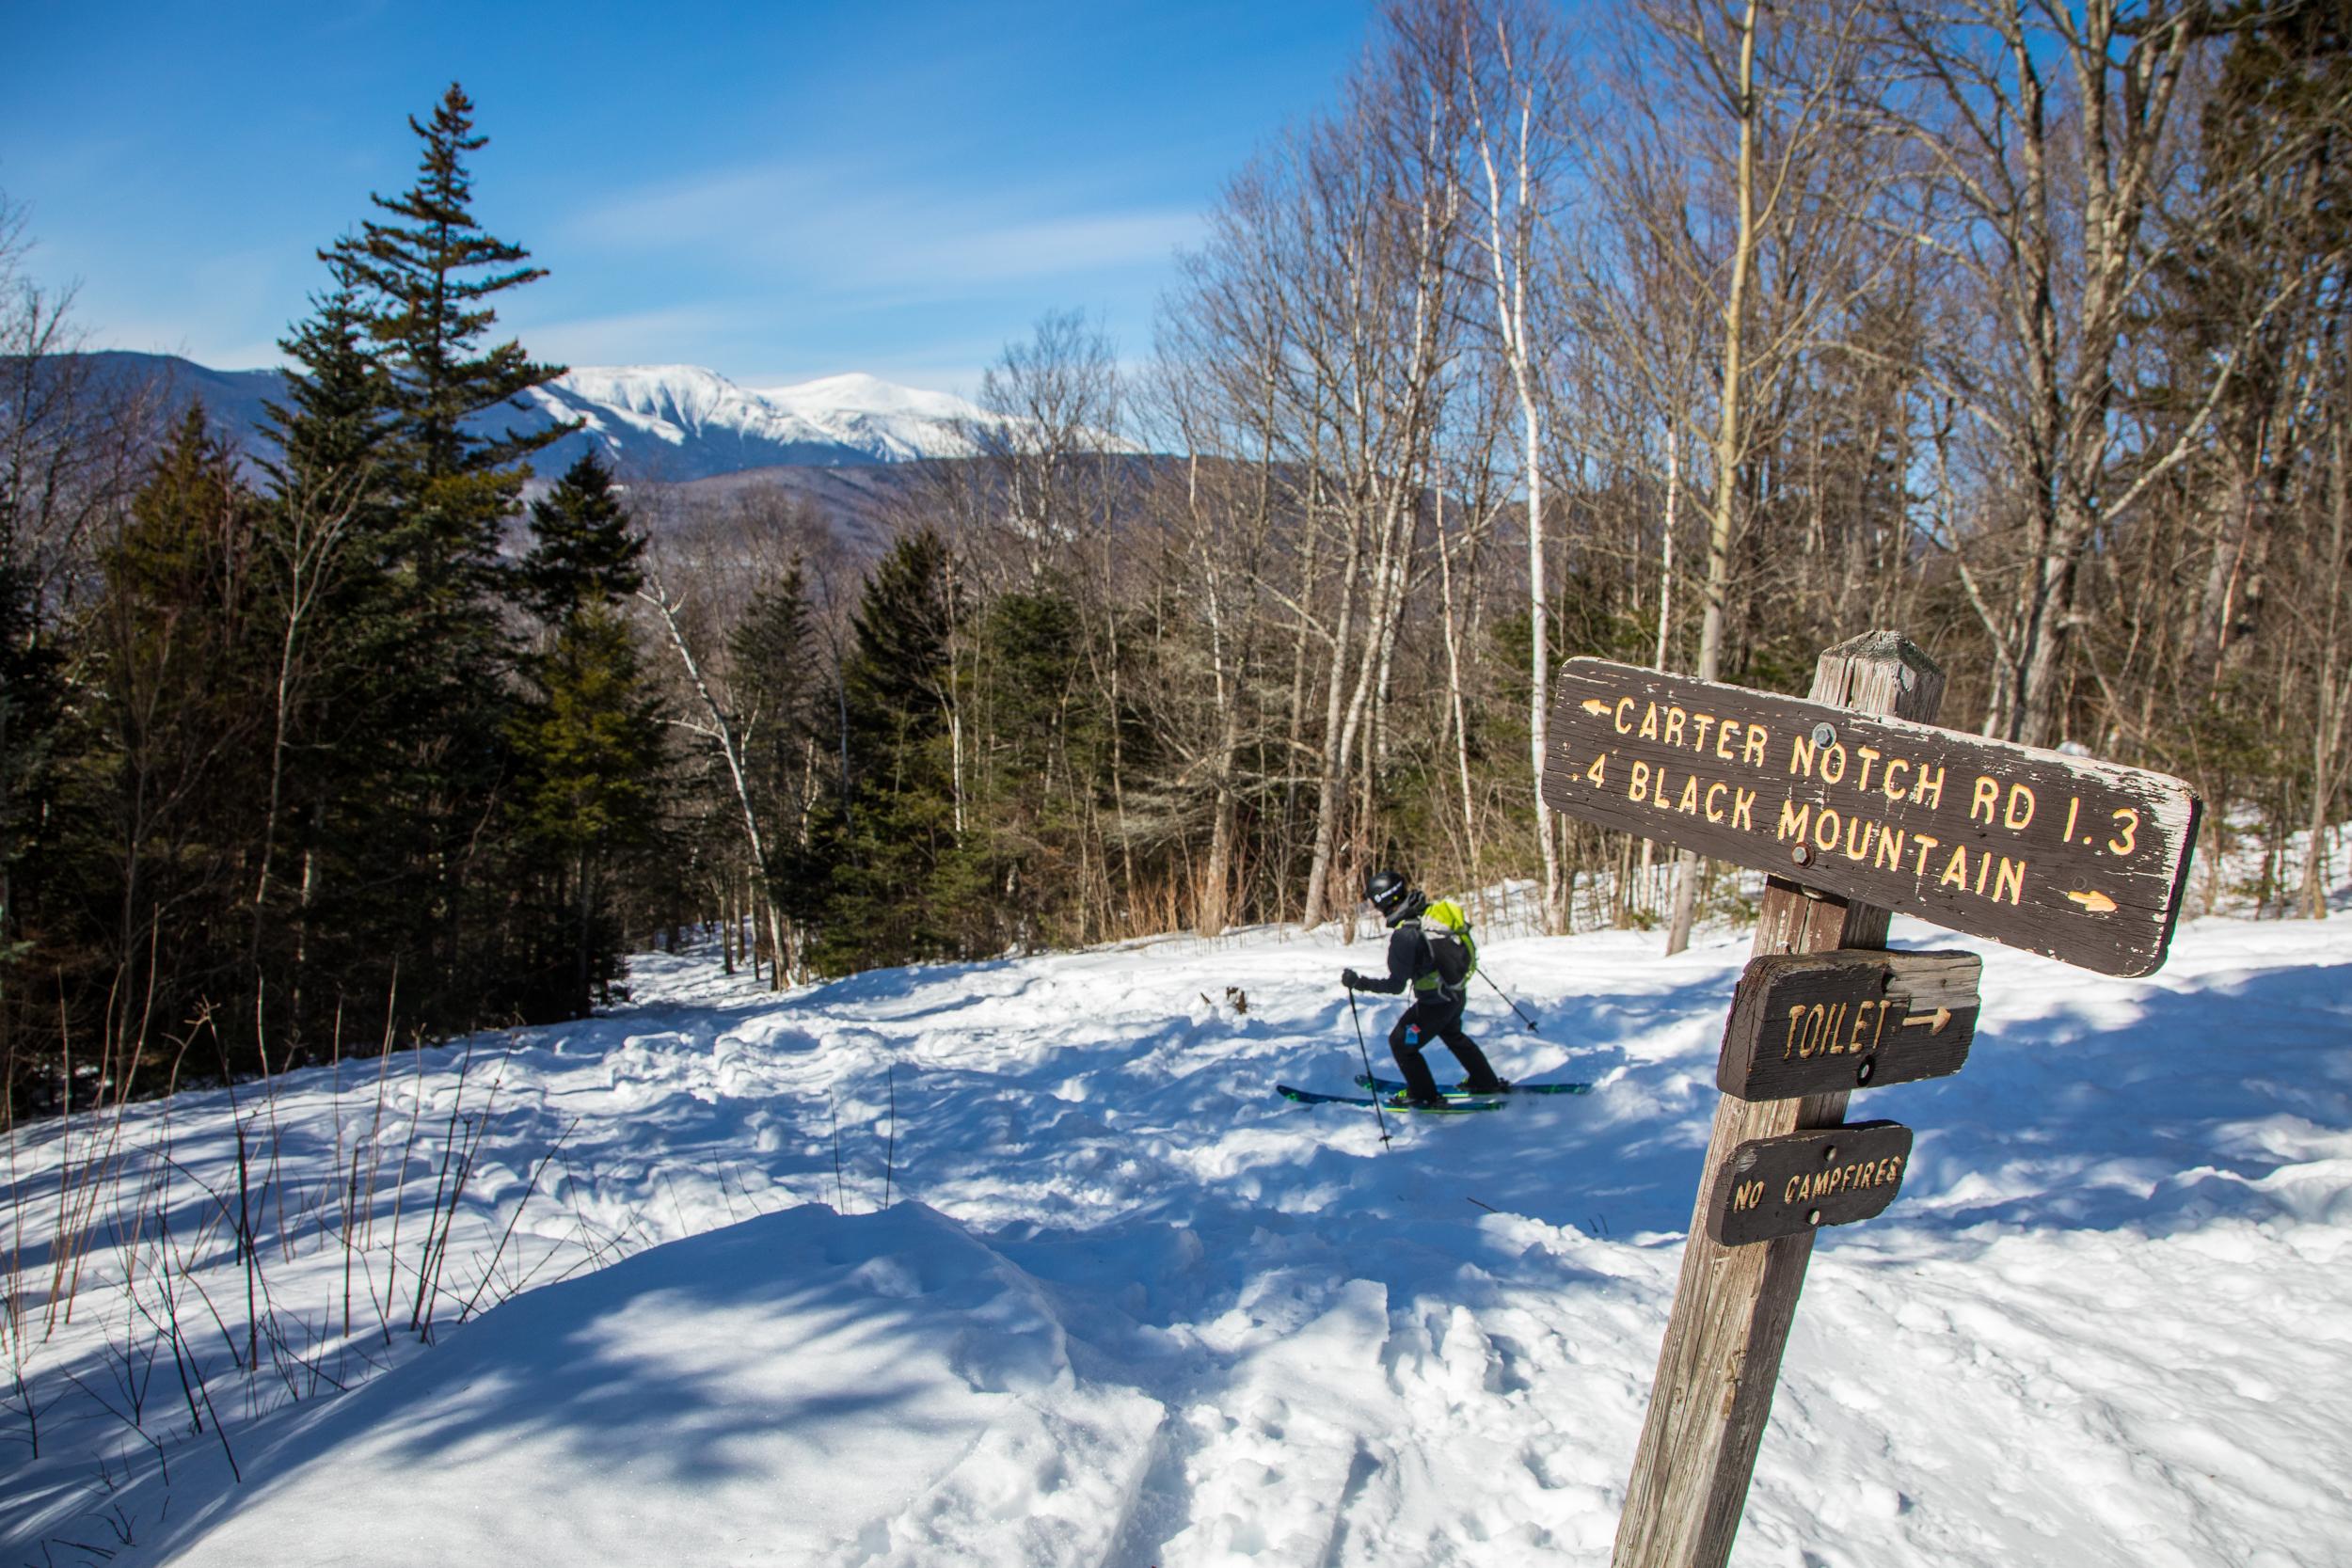 Black Mountain Ski Trail NH.jpg